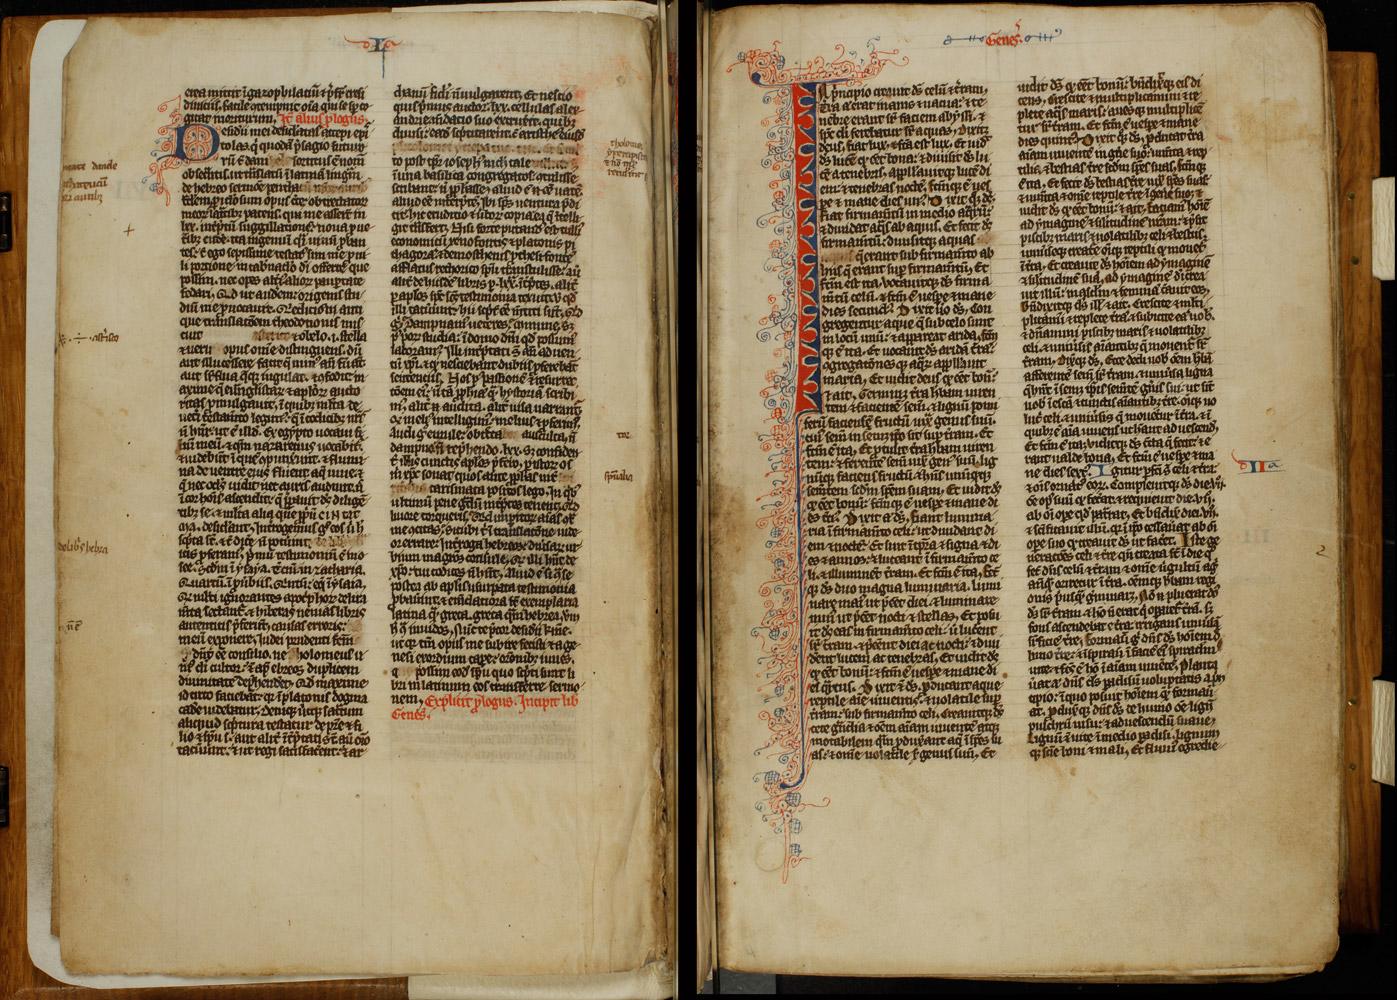 Ay Pllin Porno latin vulgate bible with - latina - xxx photos